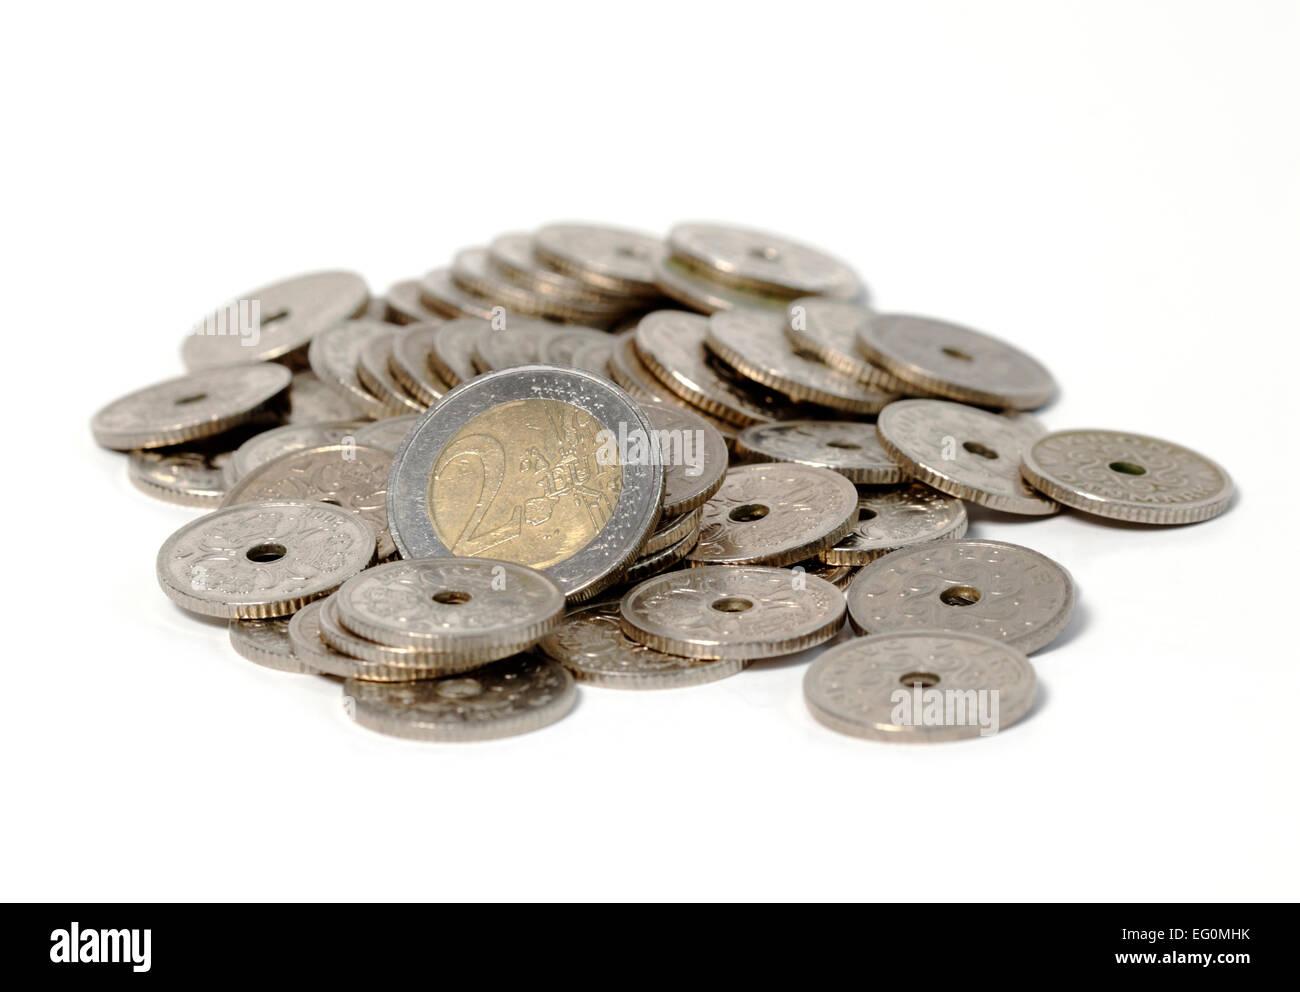 Euros balancing in the midst of Danish Kroner. A 2 Euro coin in the midst of Danish one Krone pieces on white. - Stock Image